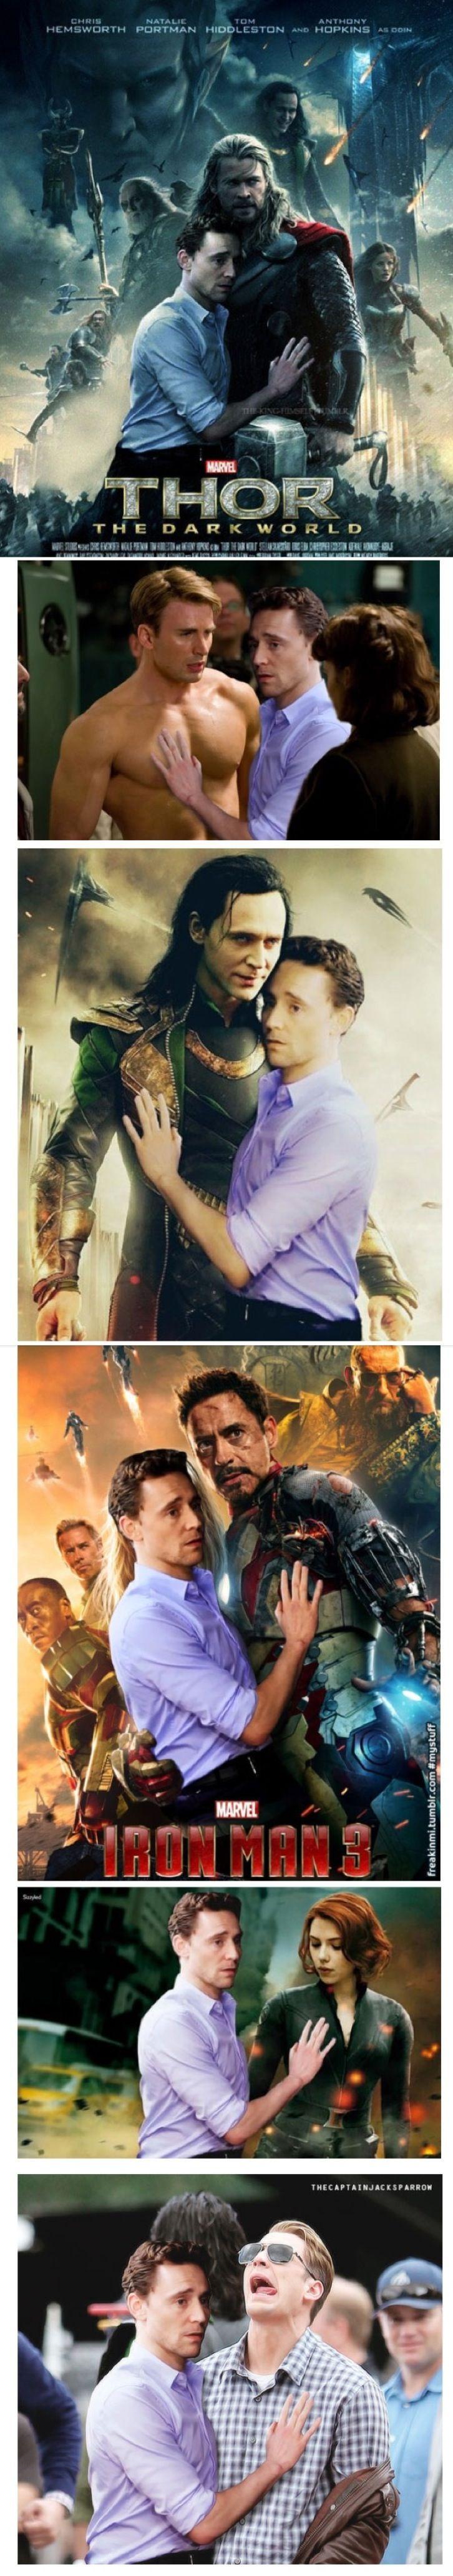 tom hiddleston meme